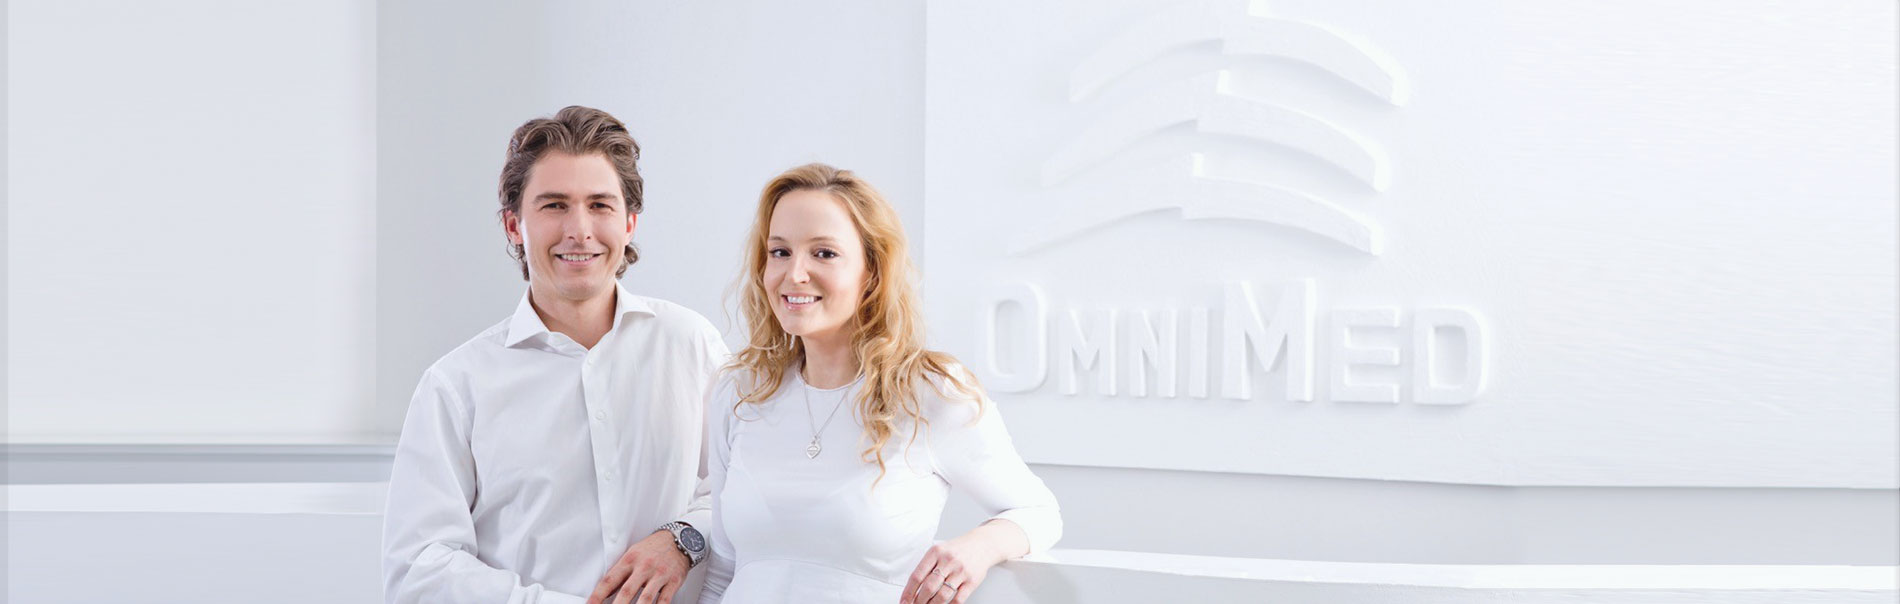 Dr. Stefan Horwath & Dr. Martina Reichhart